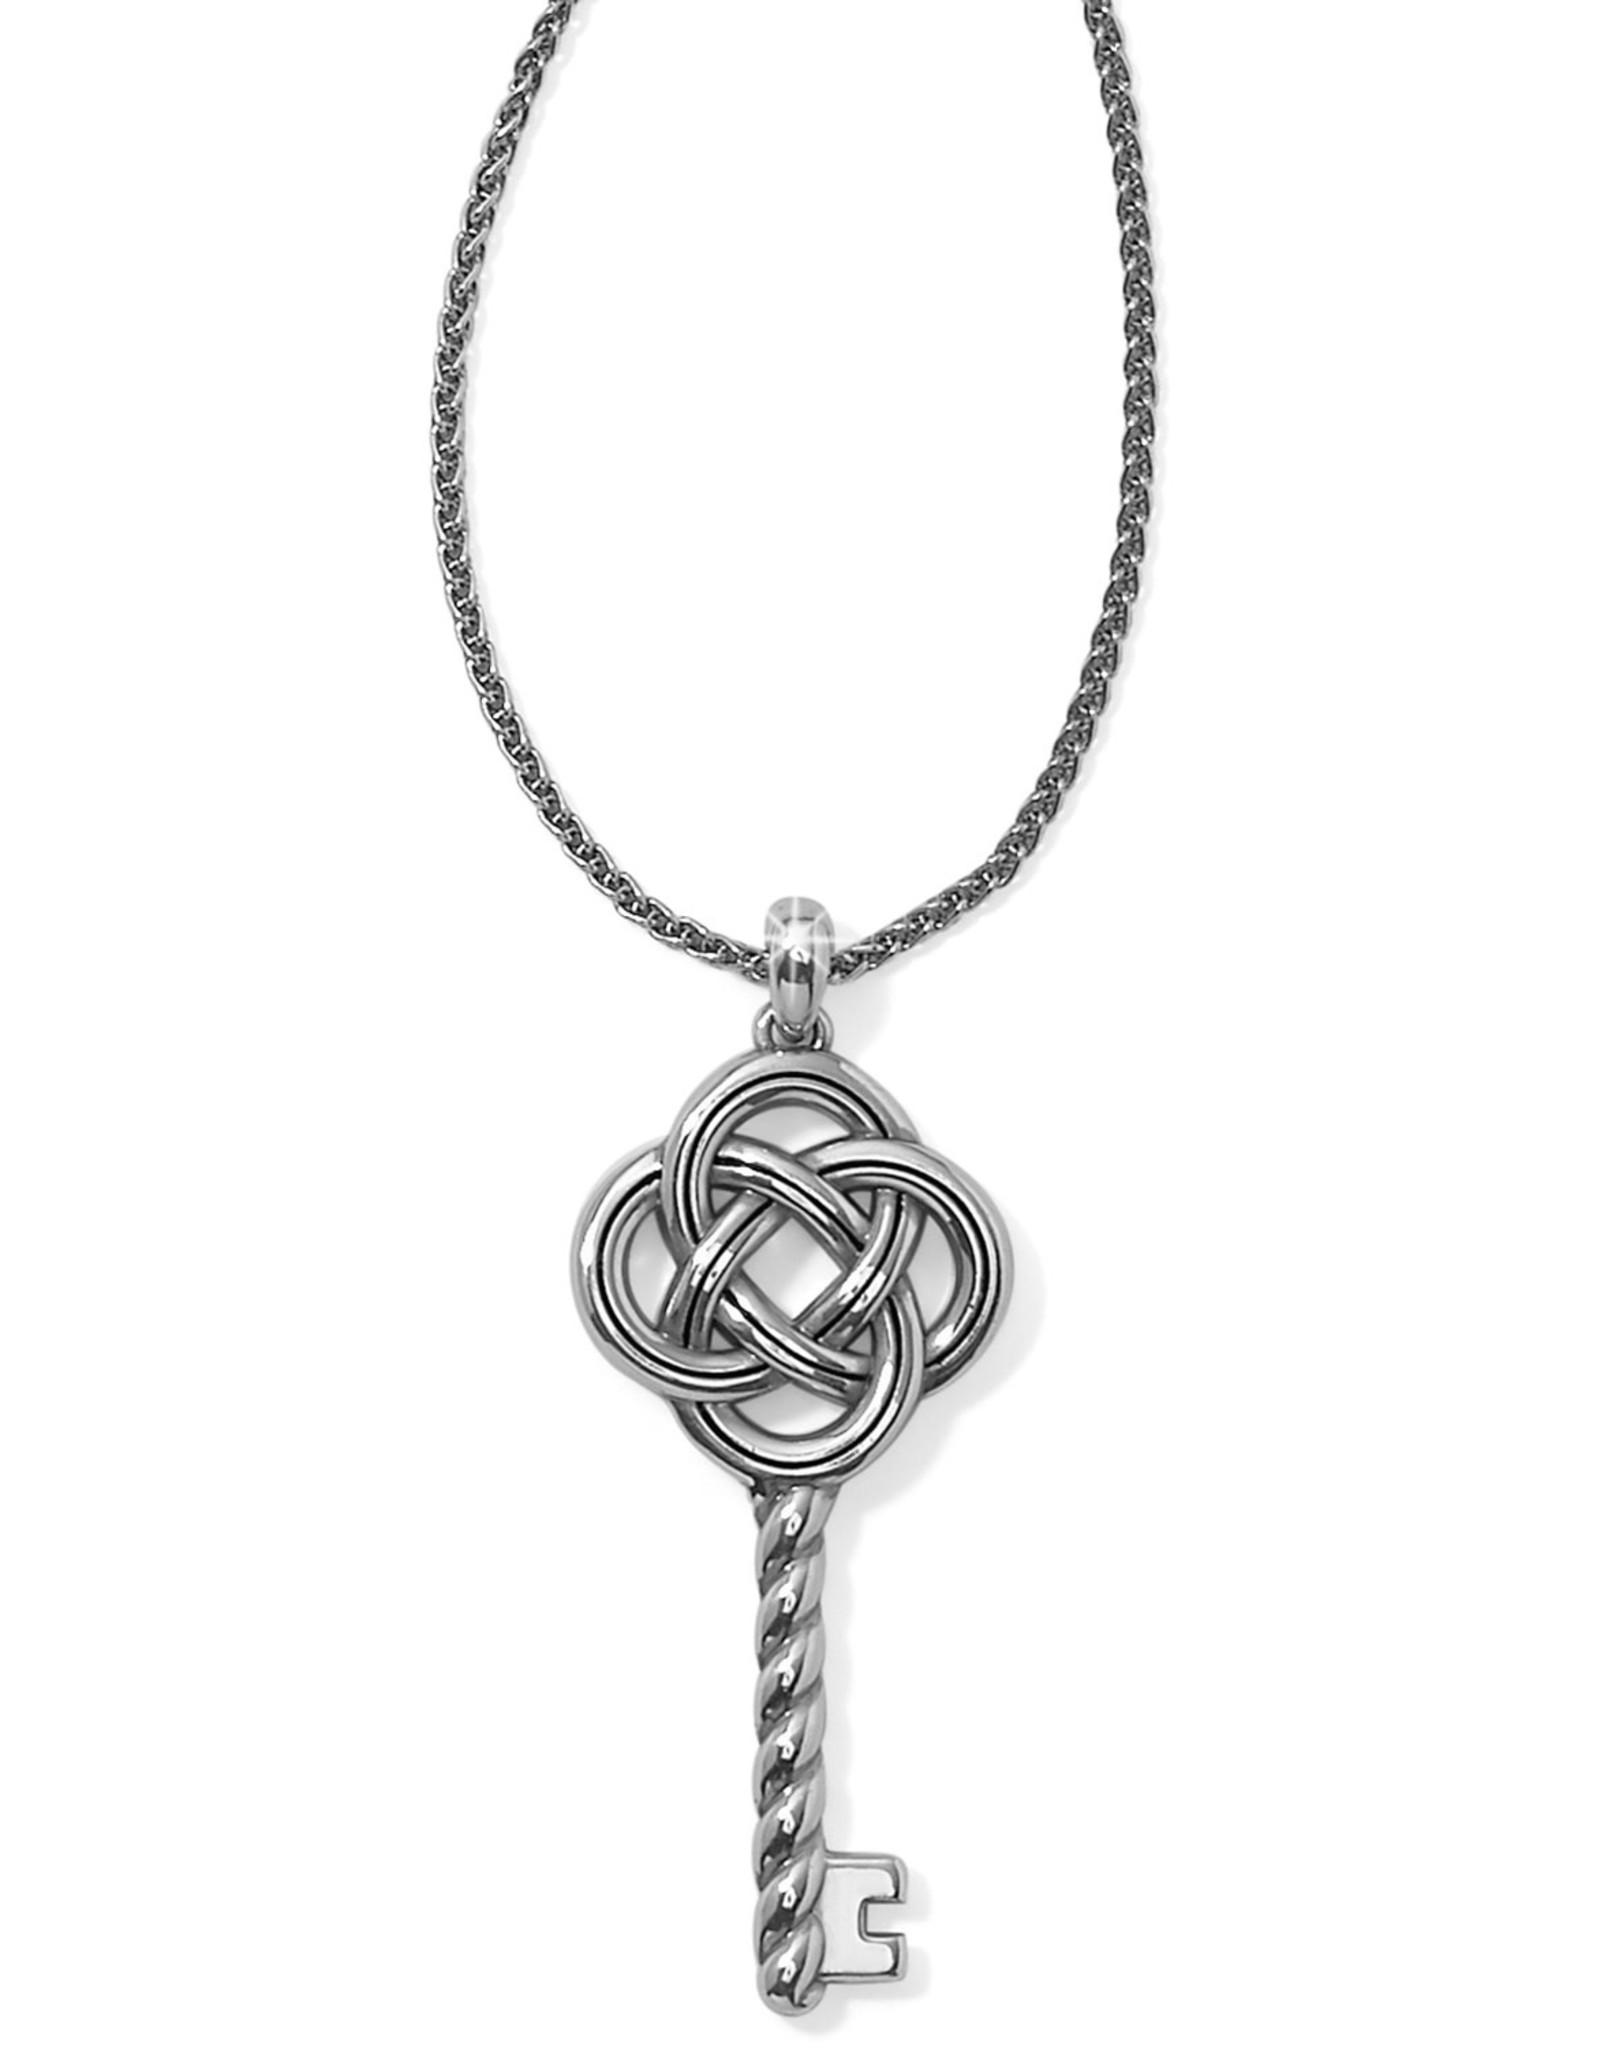 Brighton Brighton Interlock Large Key Necklace